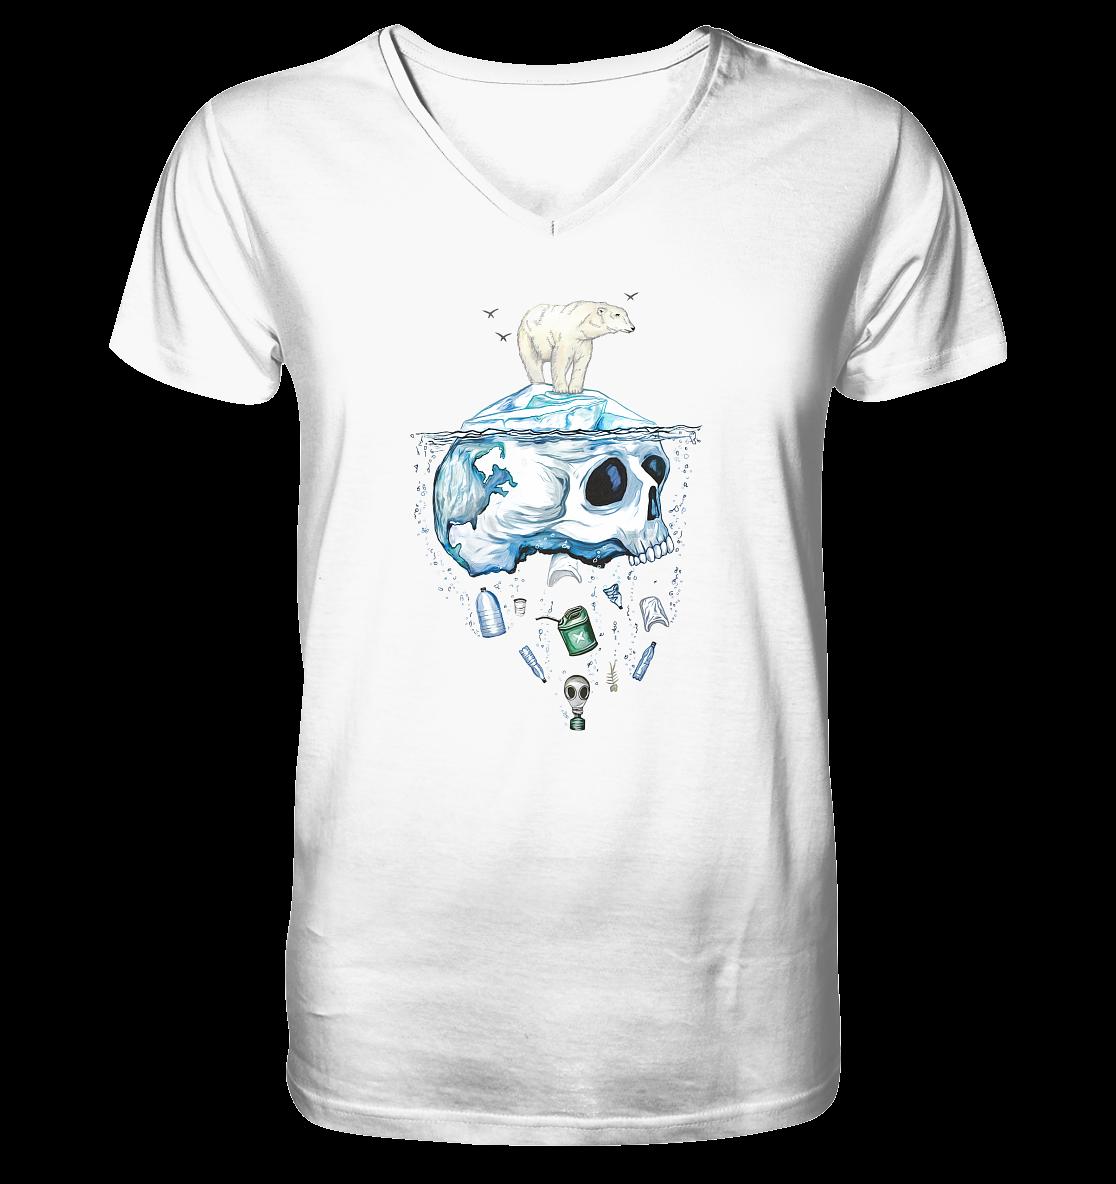 front-mens-organic-v-neck-shirt-f8f8f8-1116x.png